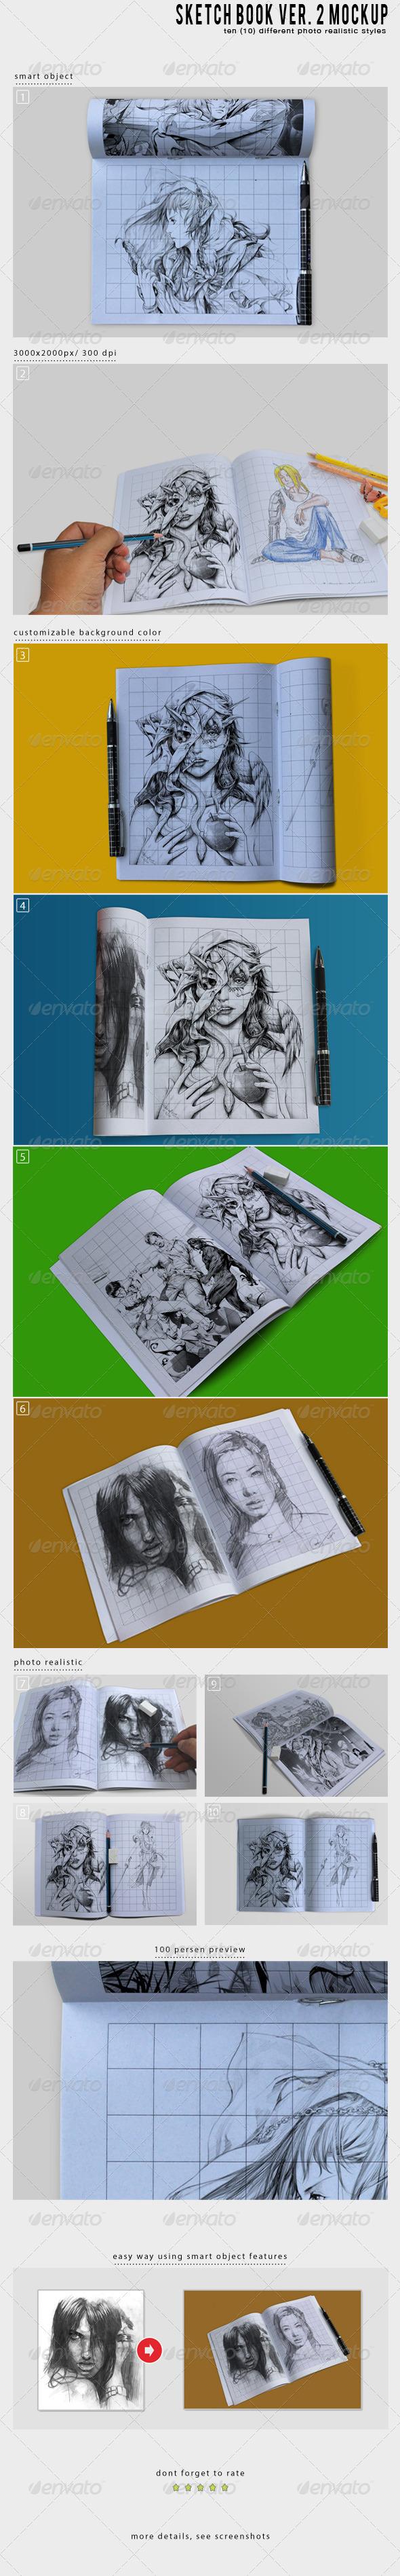 GraphicRiver Sketch Book Ver 2 Mockup 6452324